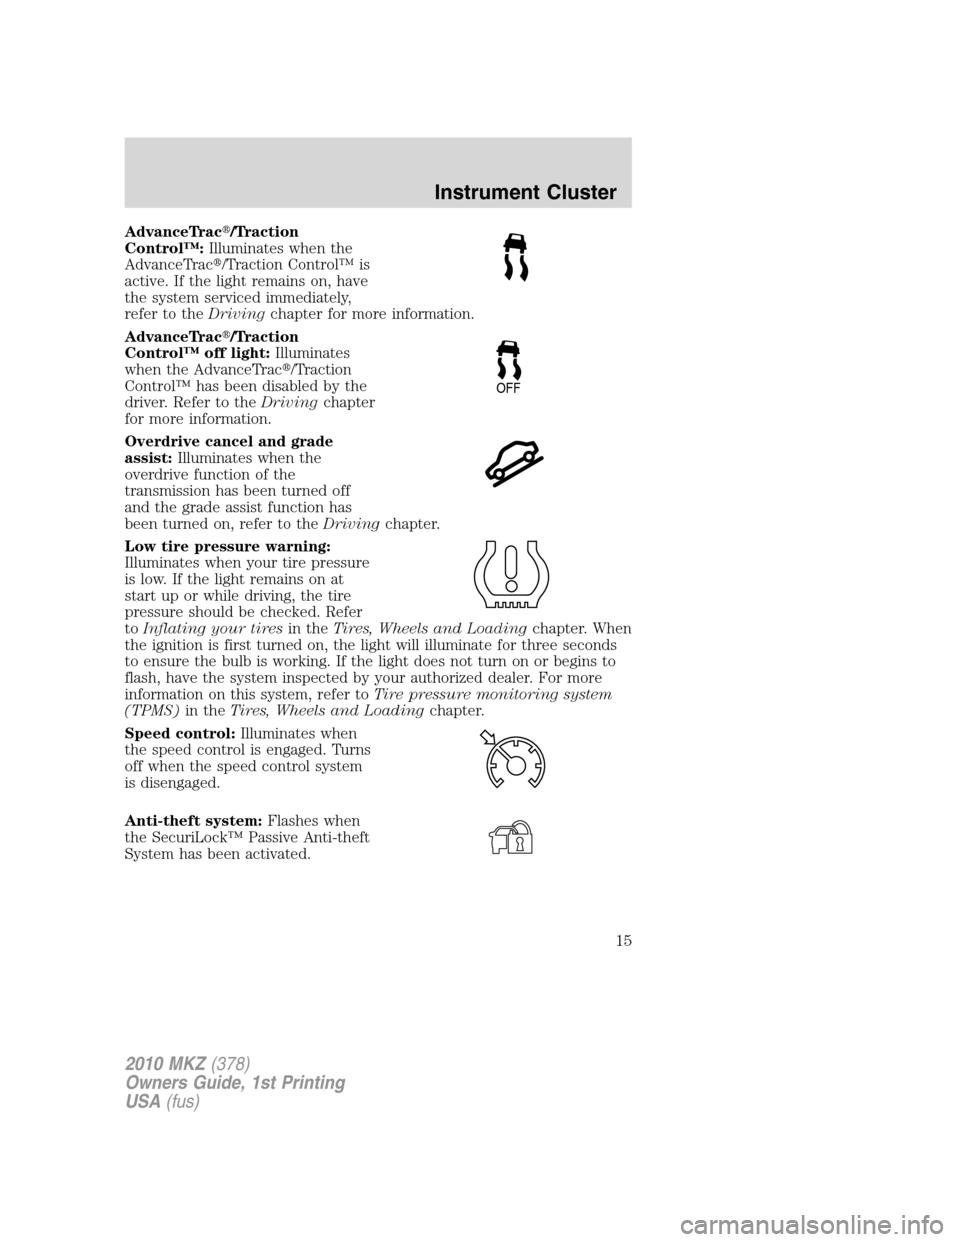 Volvo 940 Air Conditioning Wiring Diagram : Volvo air conditioning diagram imageresizertool